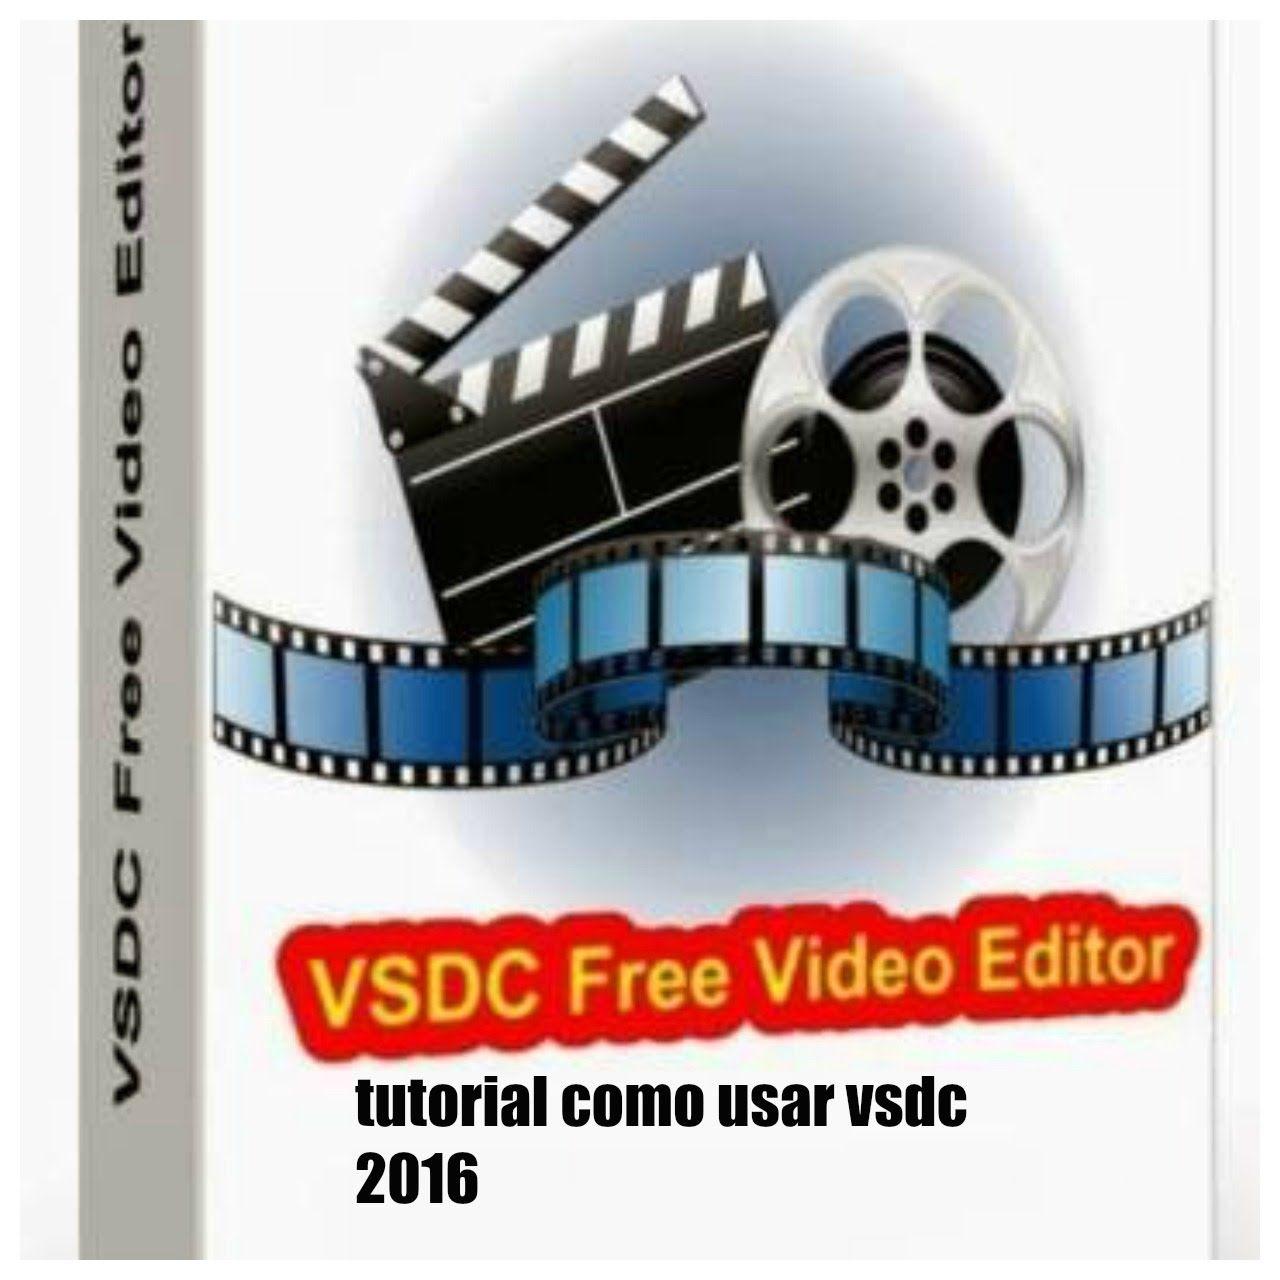 Como usar o vsdc 2016 VSDCV   LEGENDAS   Video editing